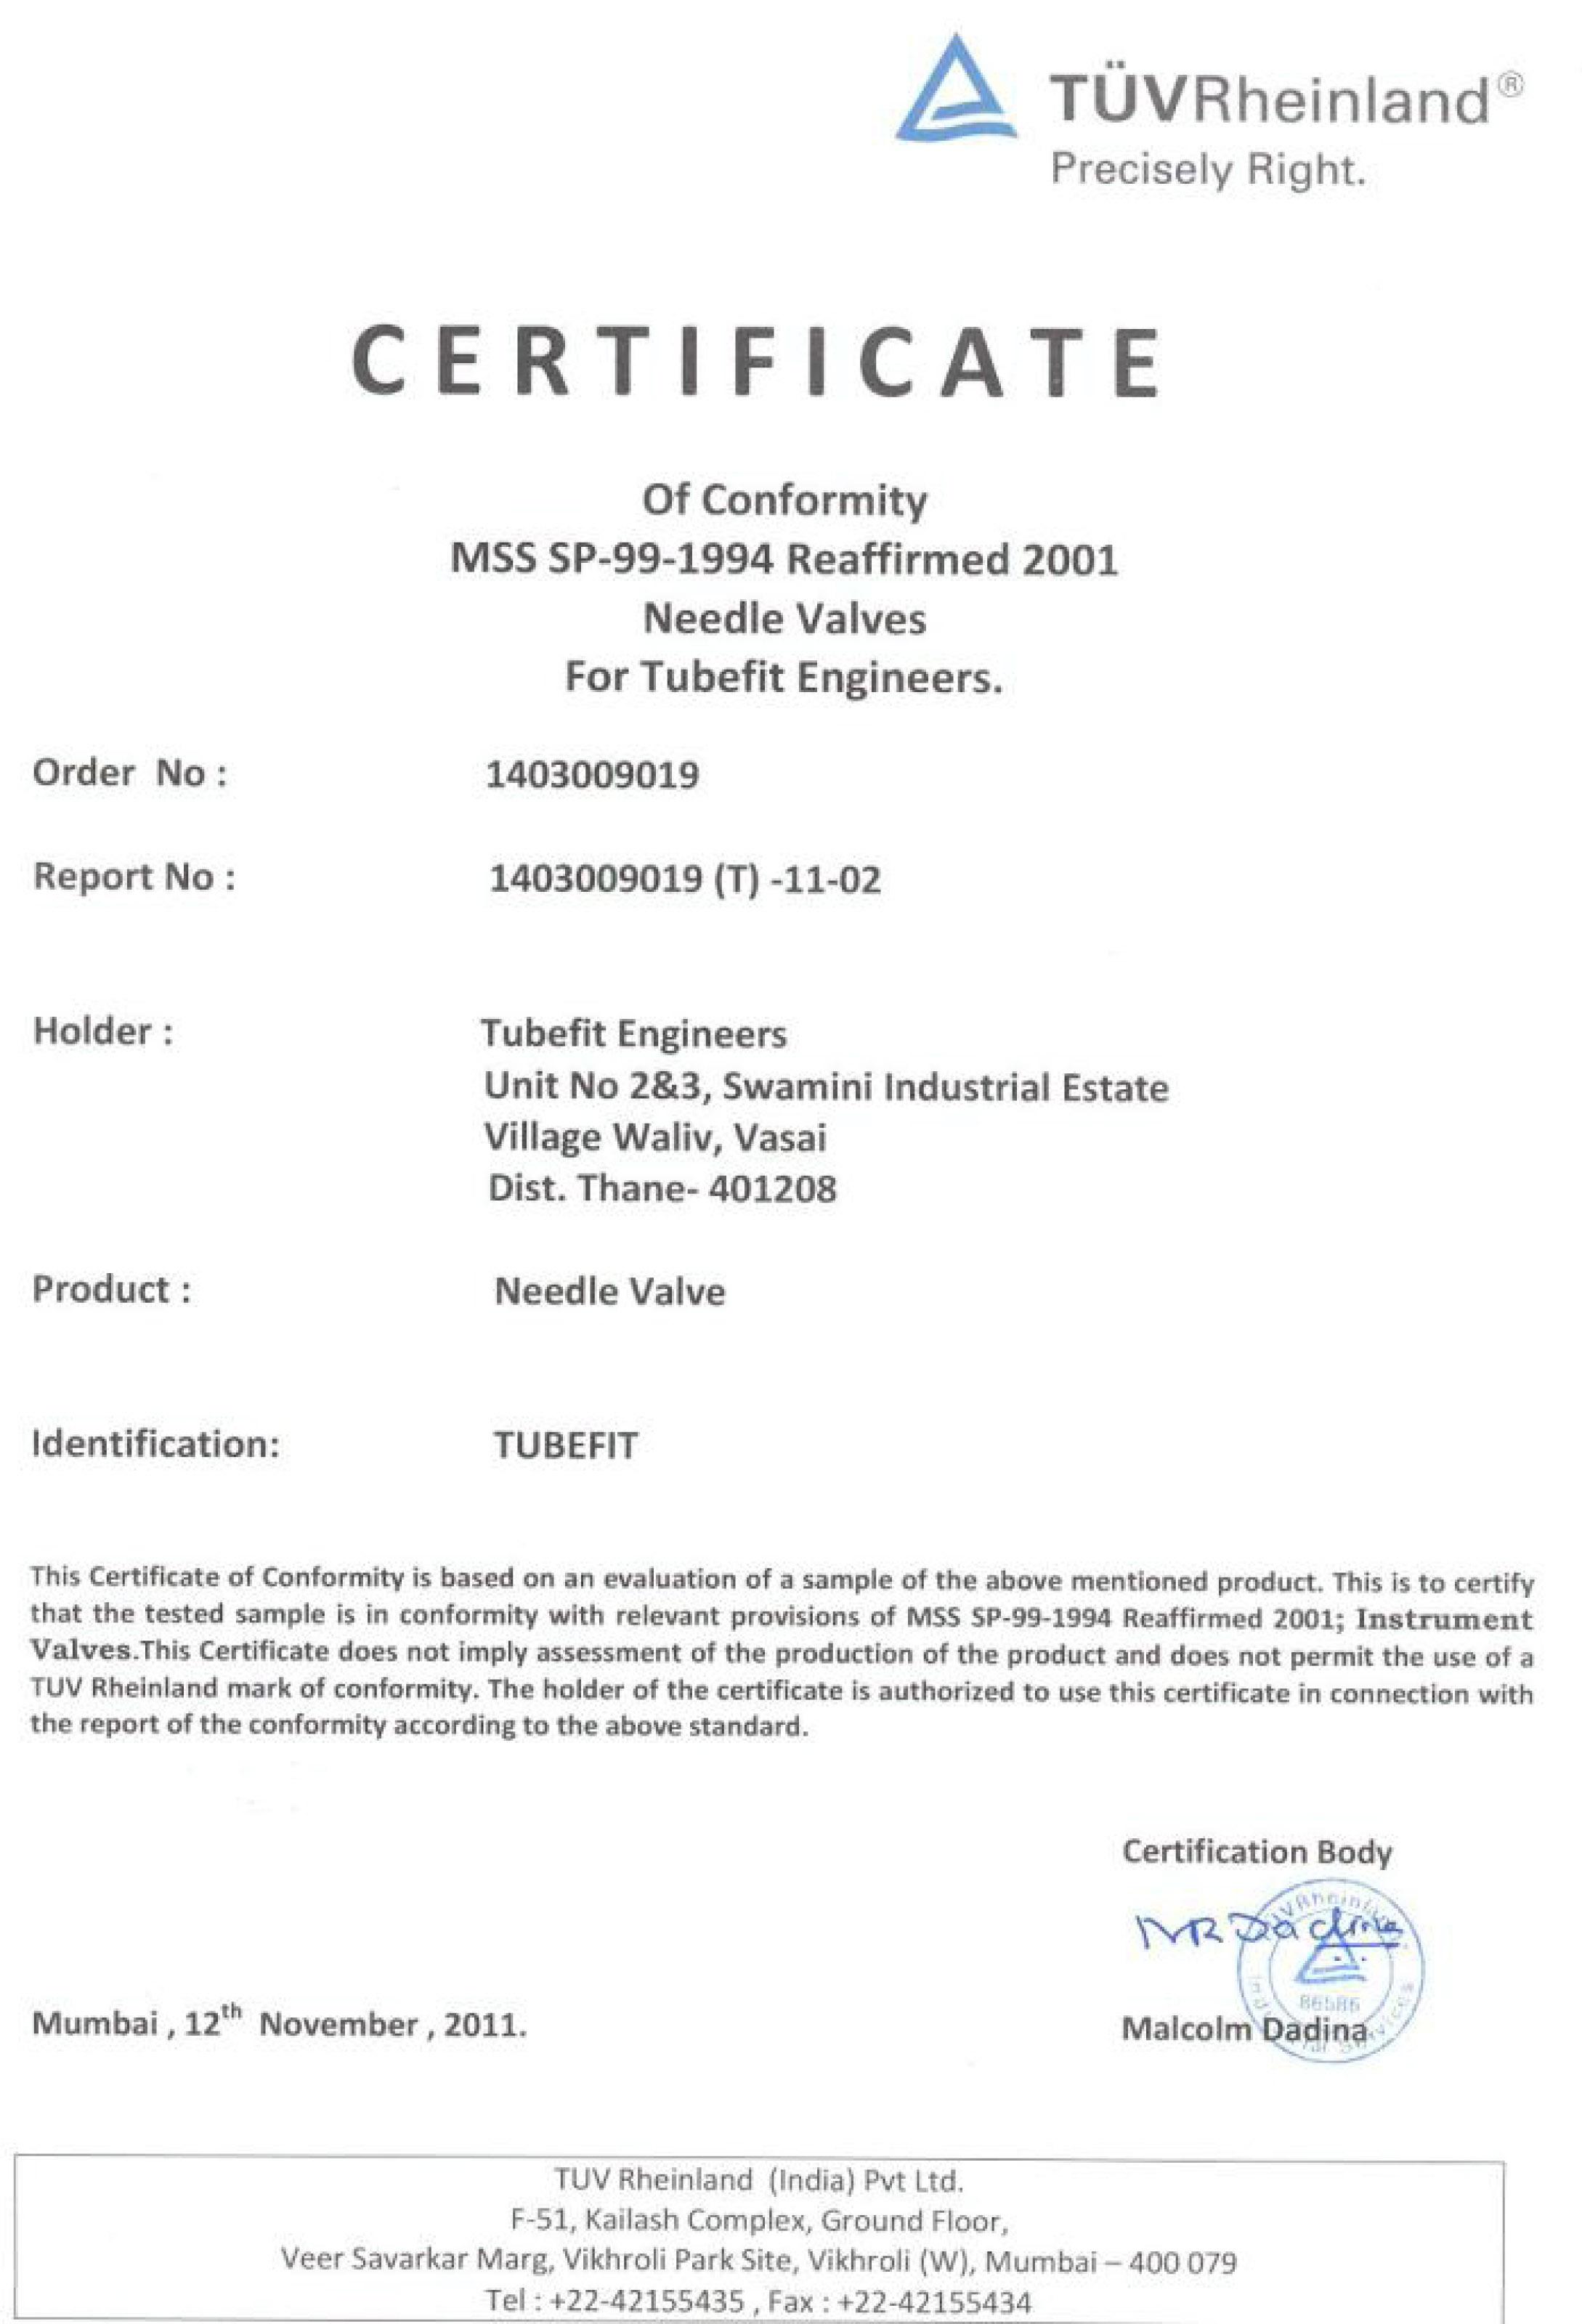 MSS SP-99-1994 Reaffirmed 2001 Needle Valves